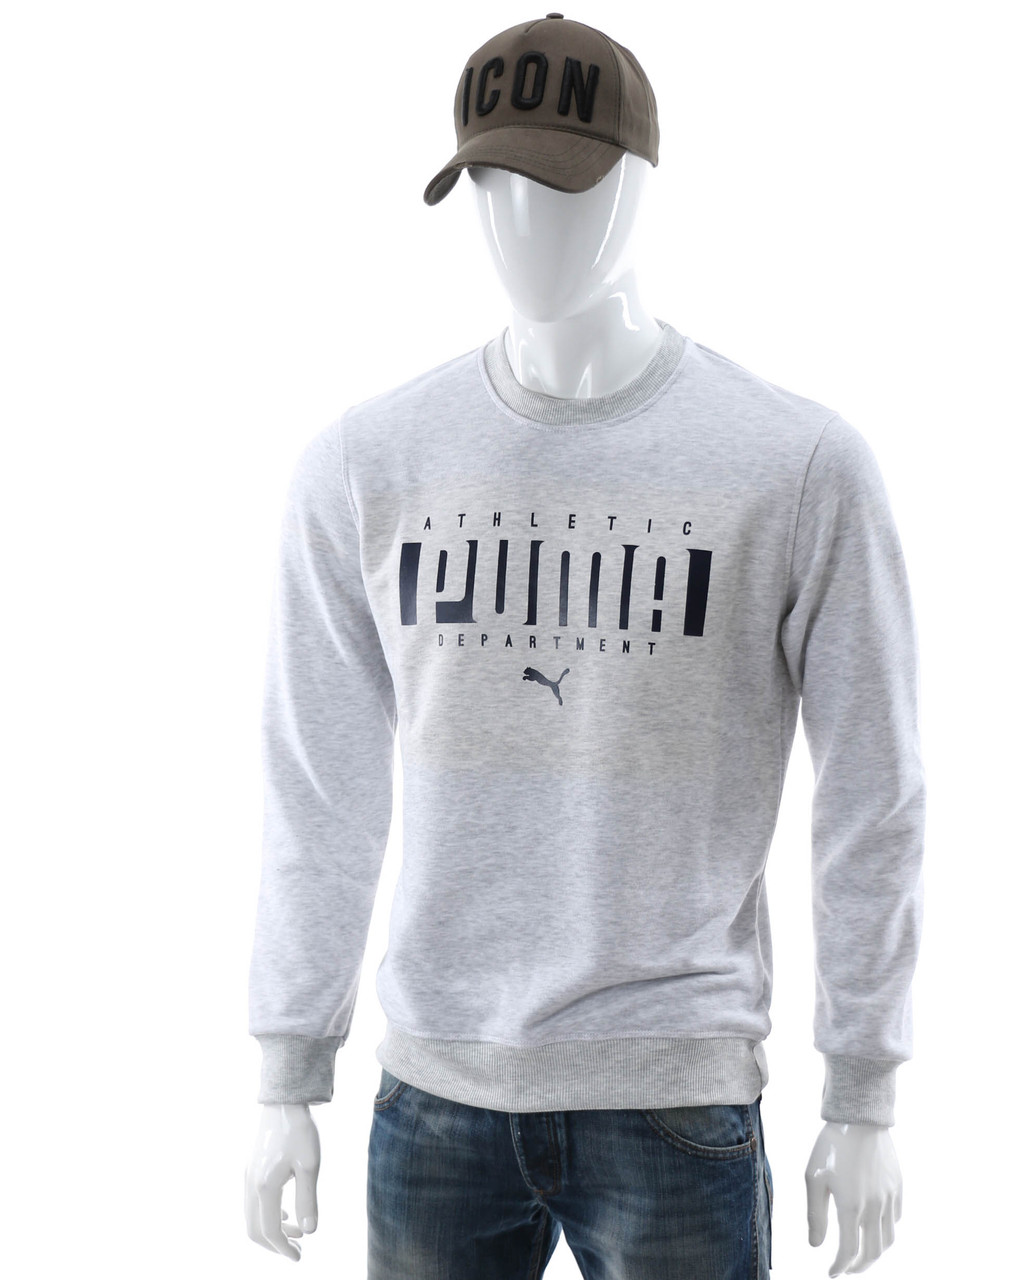 Свитшот мужской бел меланж PUMA ATHLETIC WTGRI XXL(Р) 20-406-001